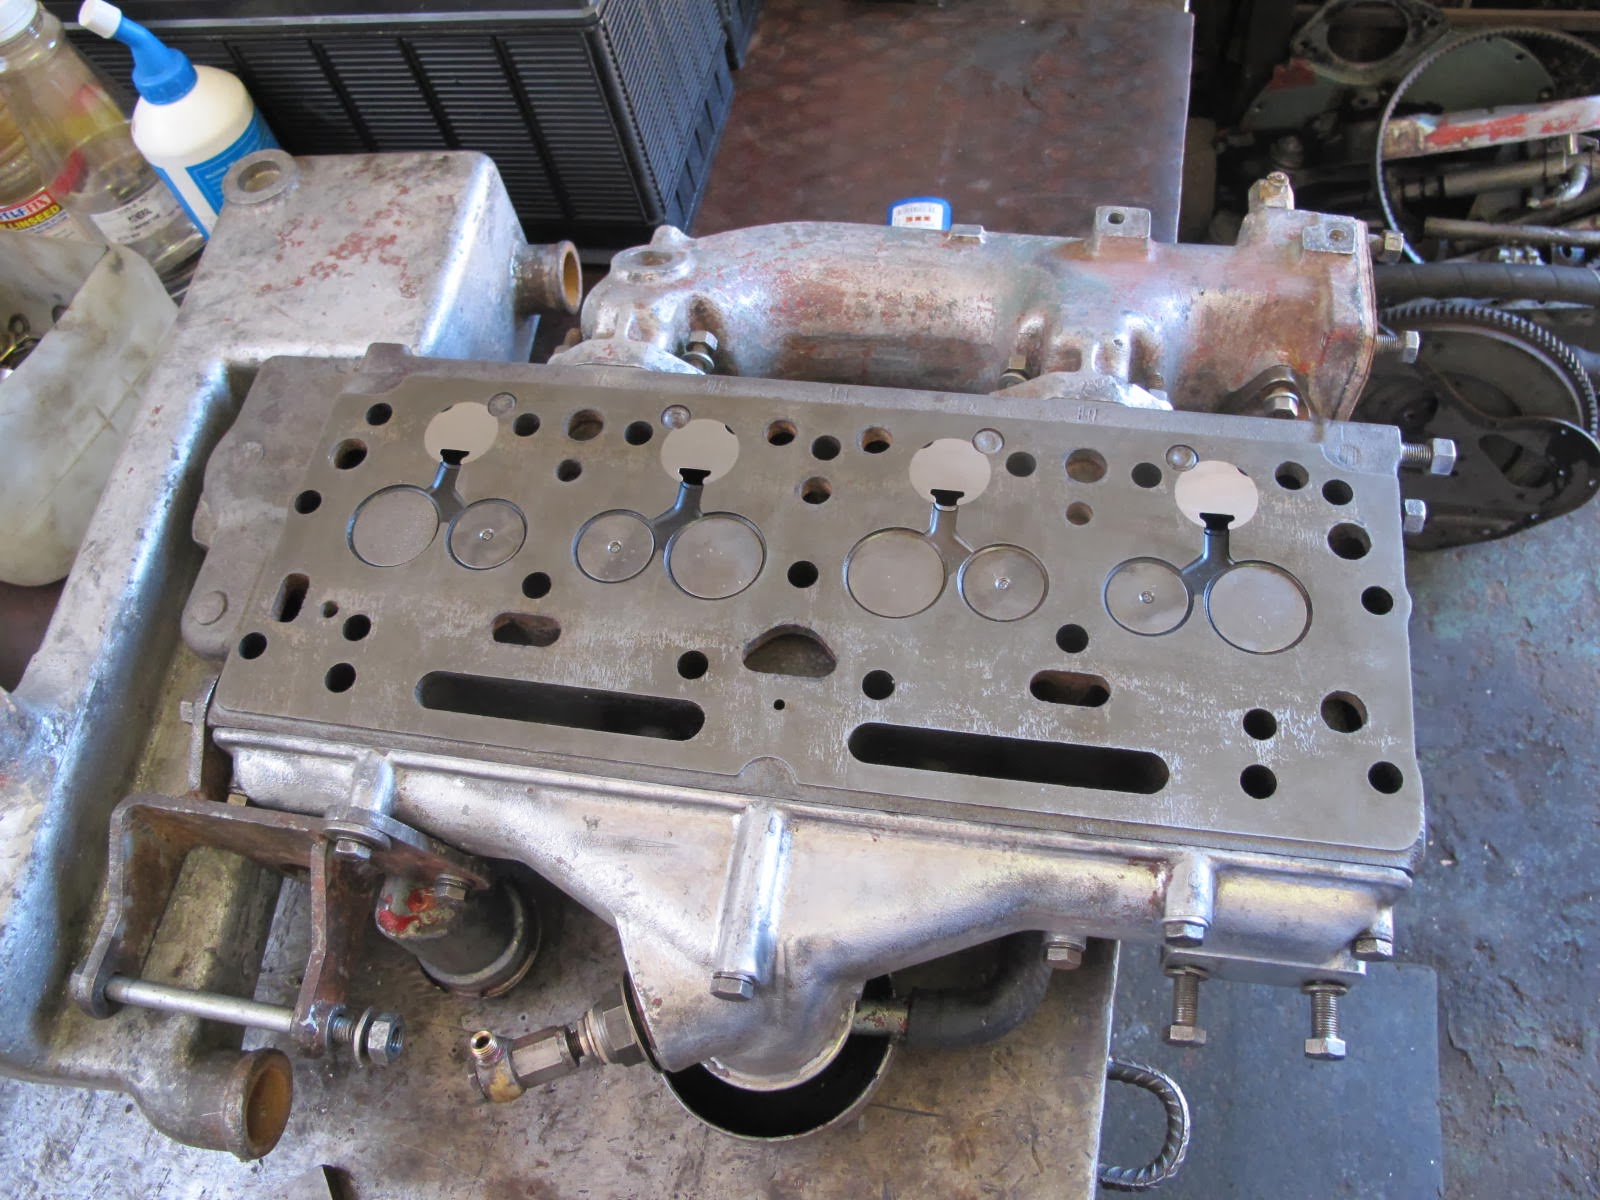 CKD Boats - Roy Mc Bride: Perkins 4108 marine engine rebuild